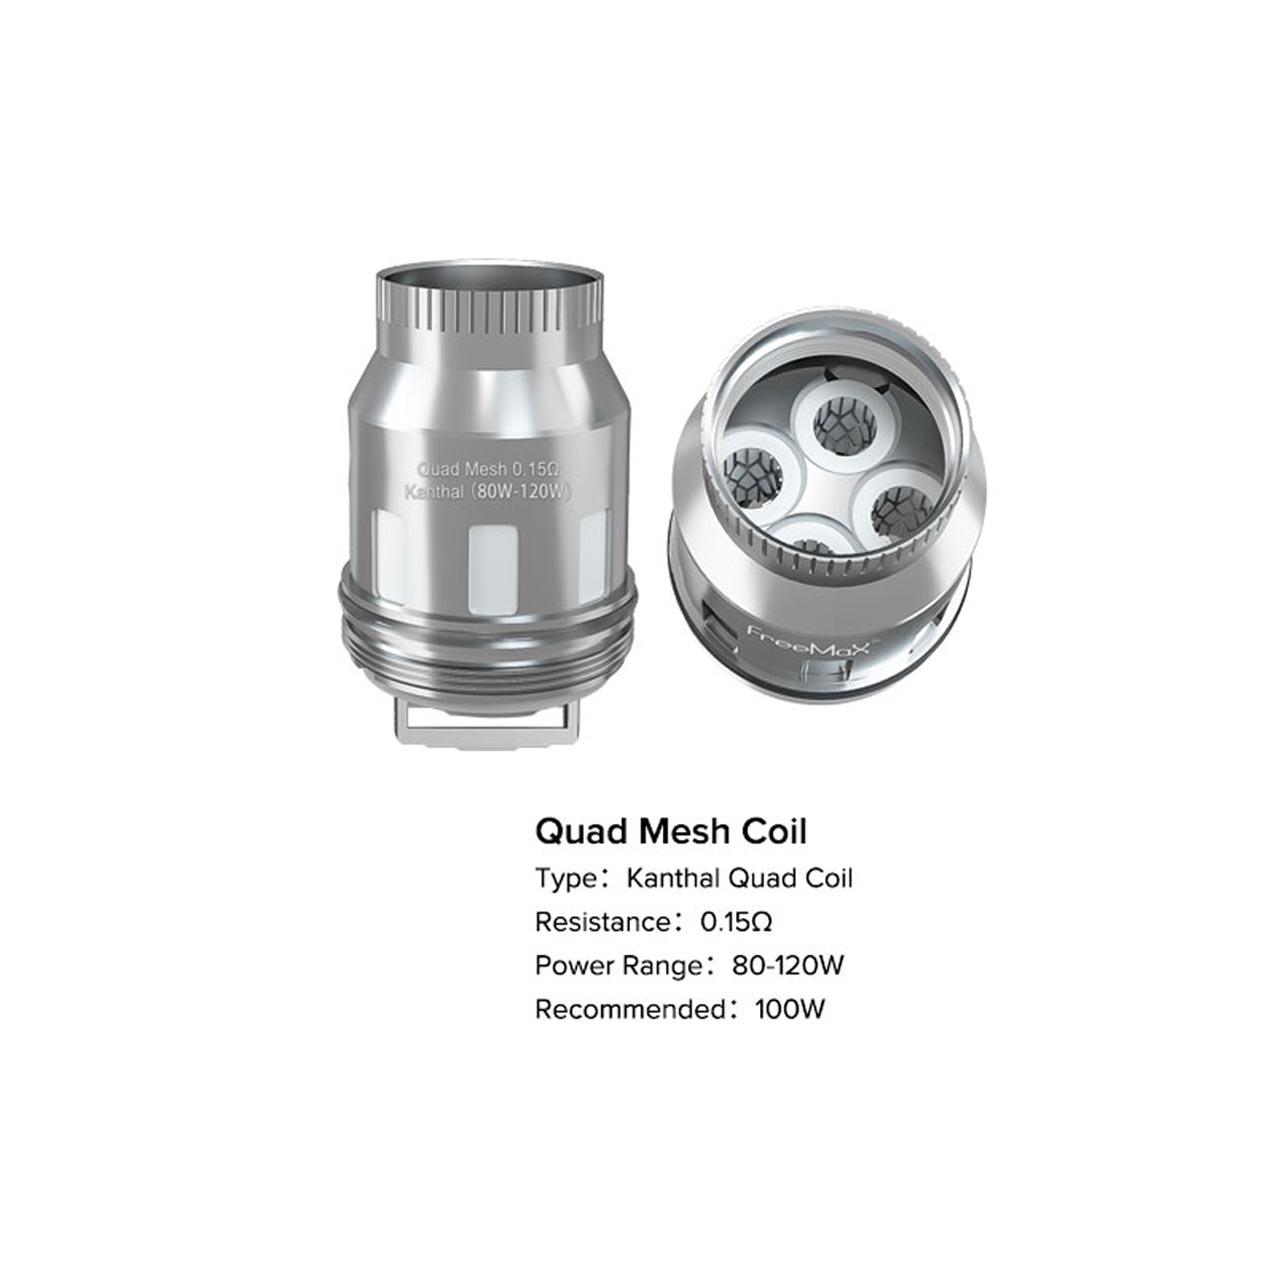 FreeMax FireLuke Mesh Pro Replacement Coil - 3PK Wholesale | Freemax Vape Wholesale